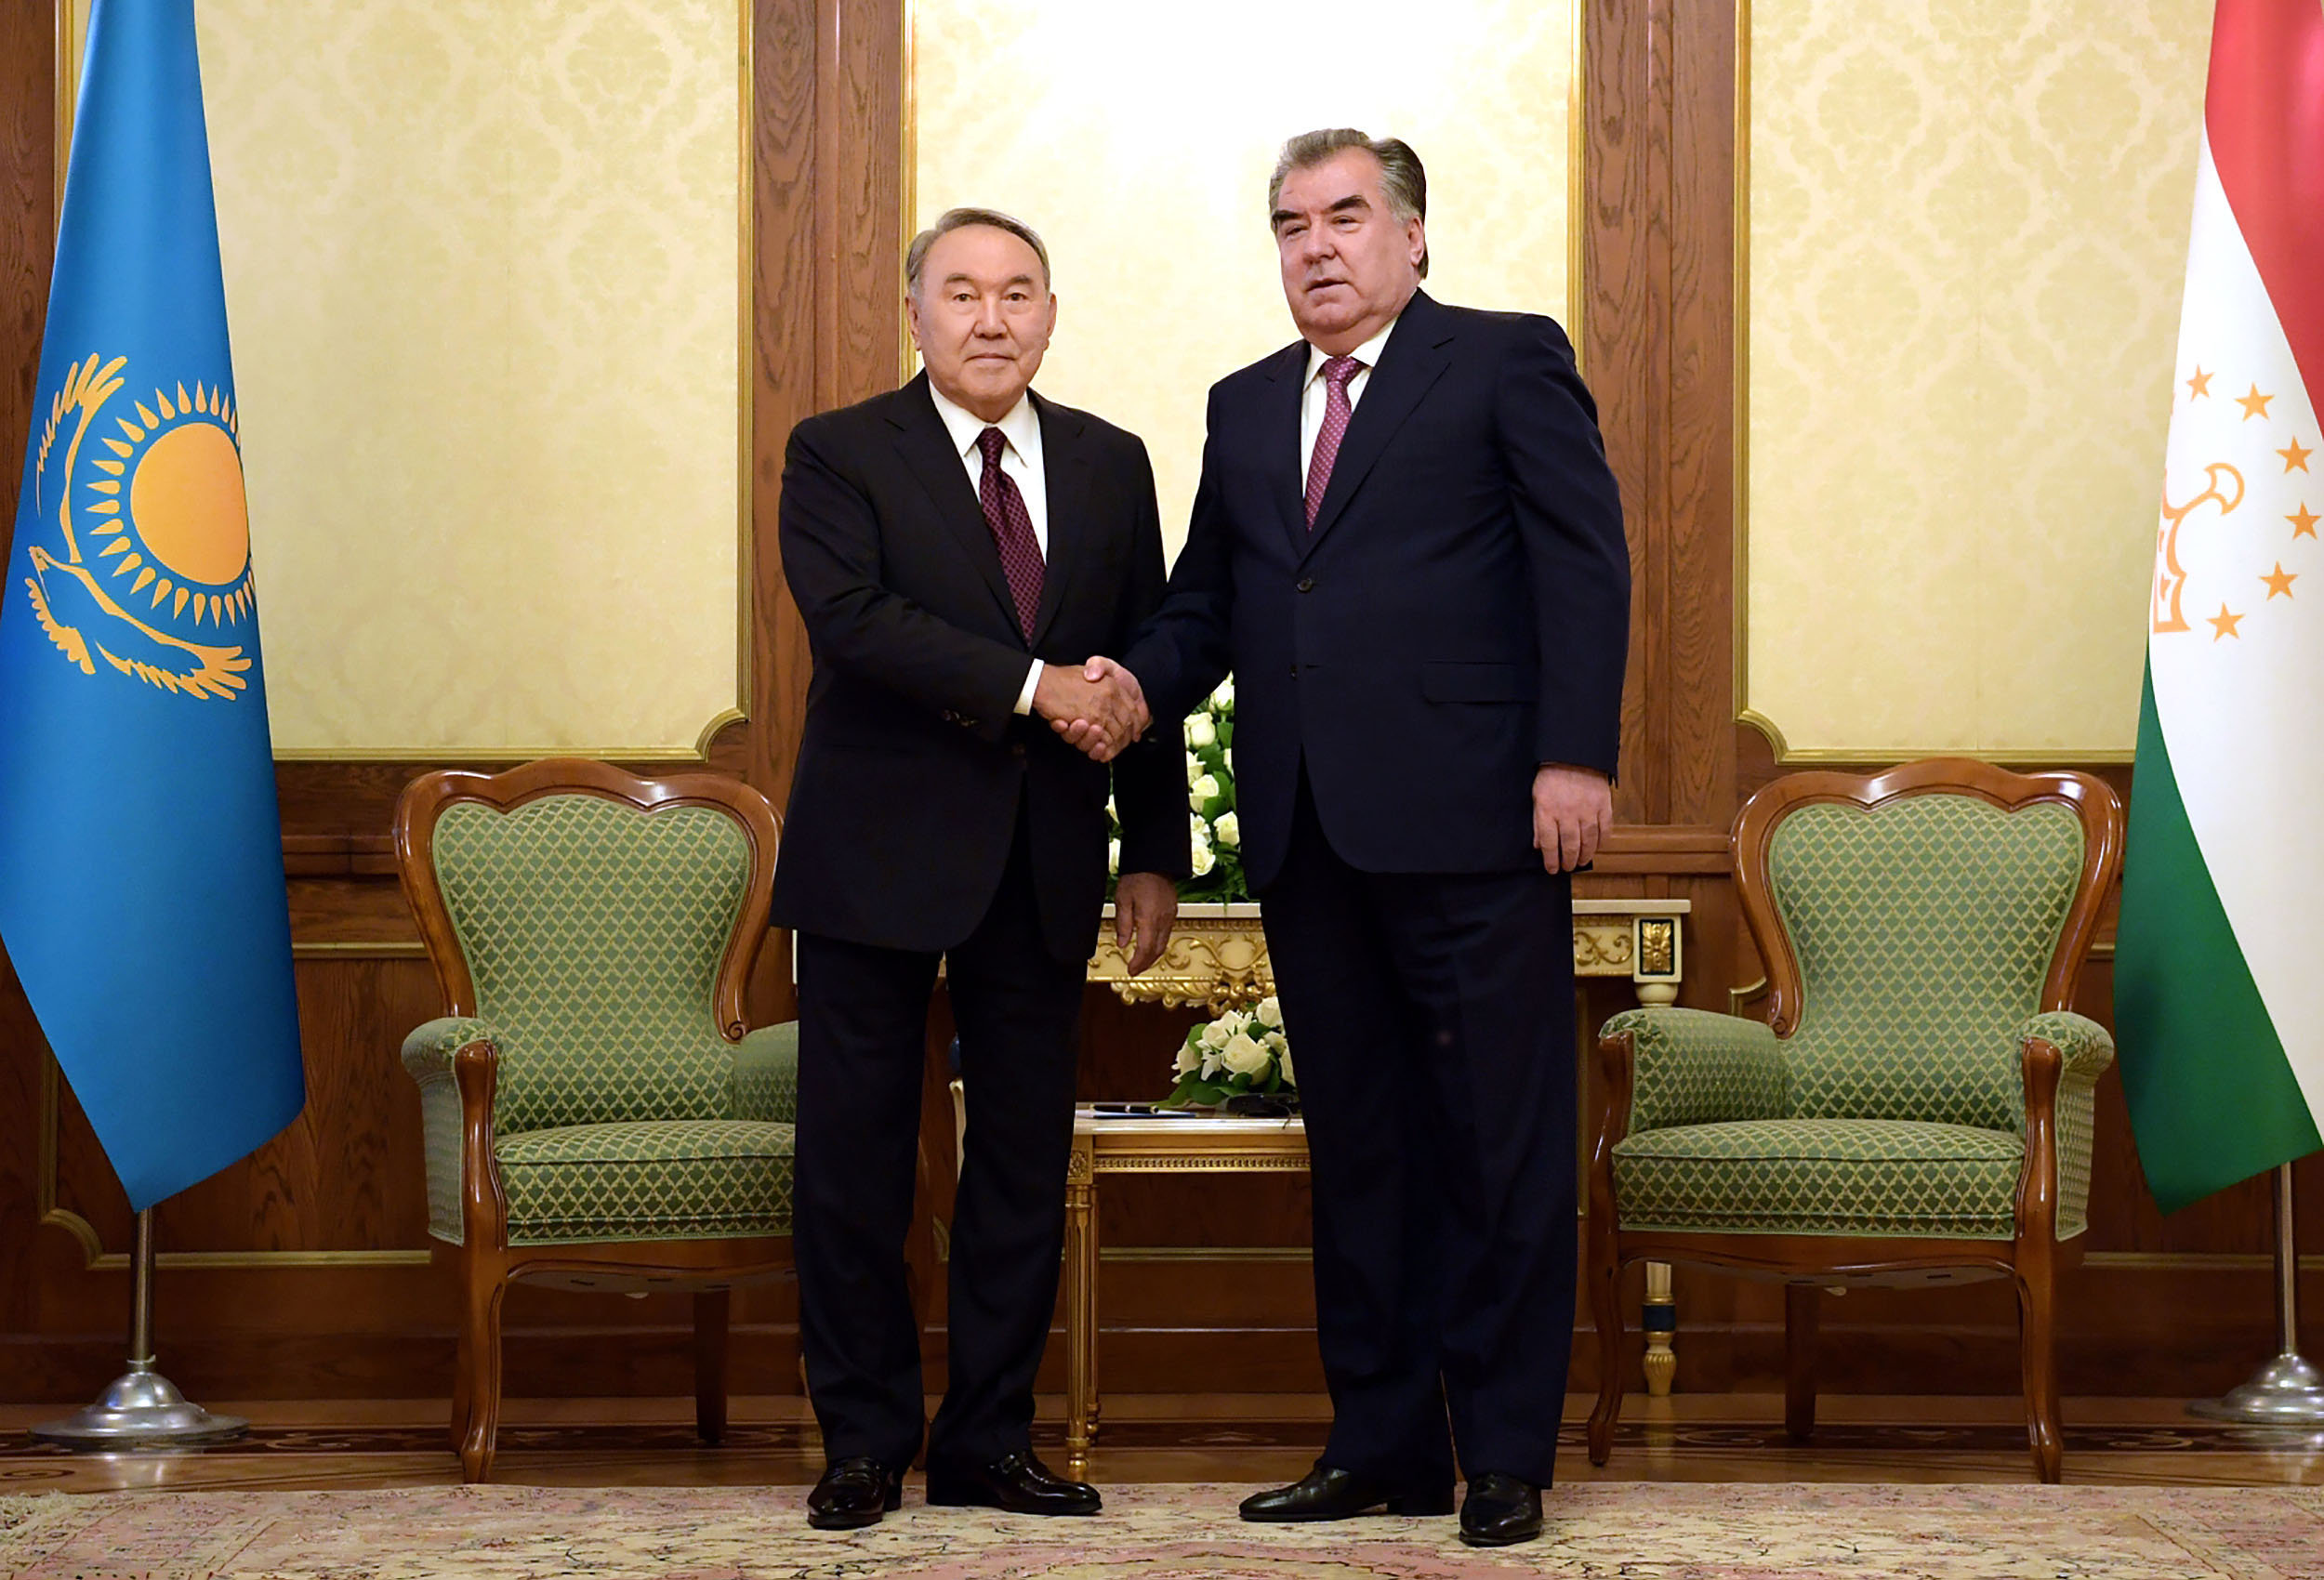 Президент Казахстана Нурсултан Назарабаев и президент Таджикистана Эмомали Рахмон